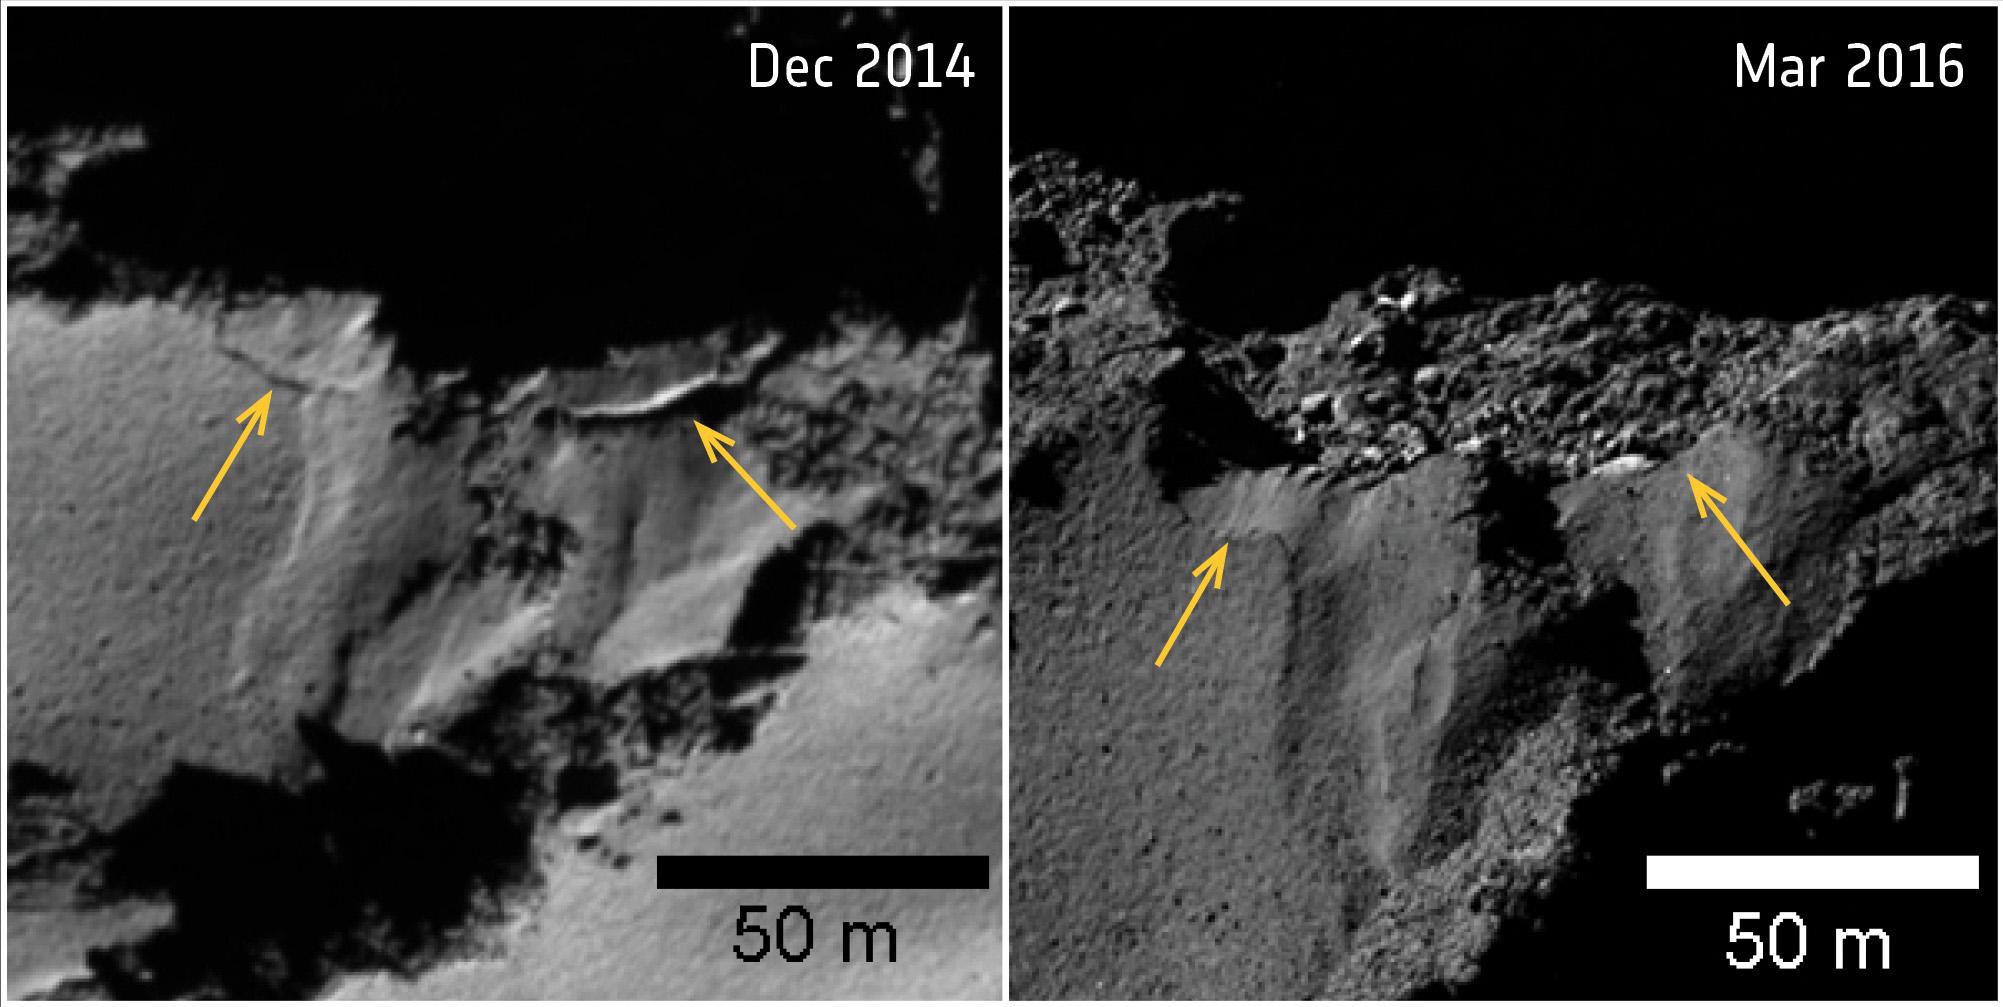 1567215191674-ESA_Rosetta_CometChanges_CollapsingCliff.jpg